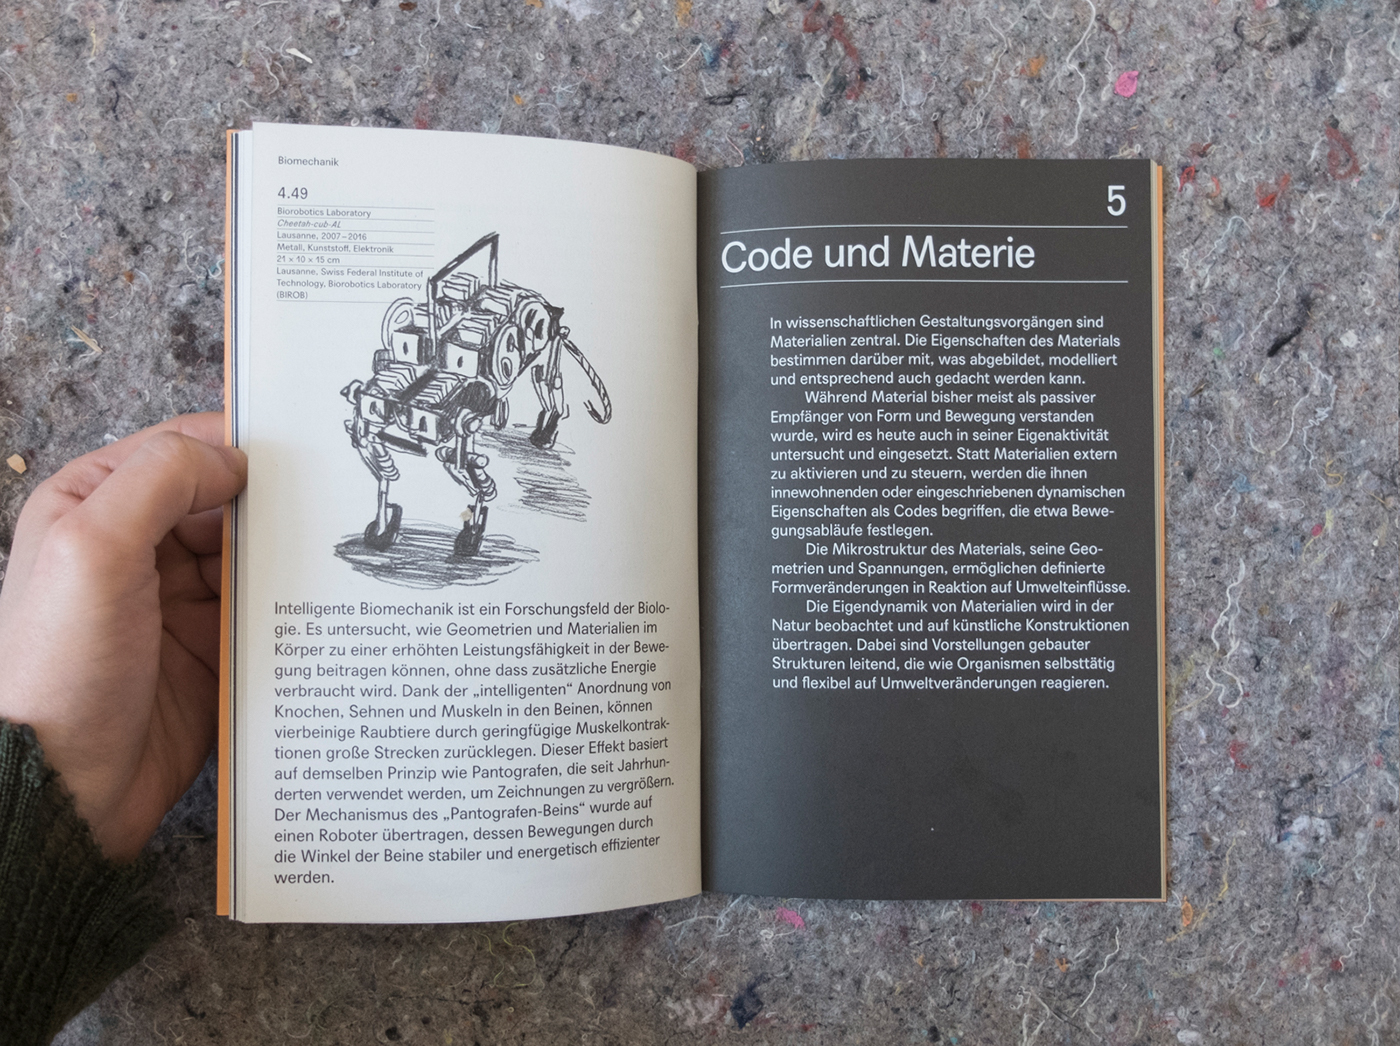 Exhibition  Guide drawings NODE Berlin Oslo Martin-Gropius-Bau art future Technology ILLUSTRATION